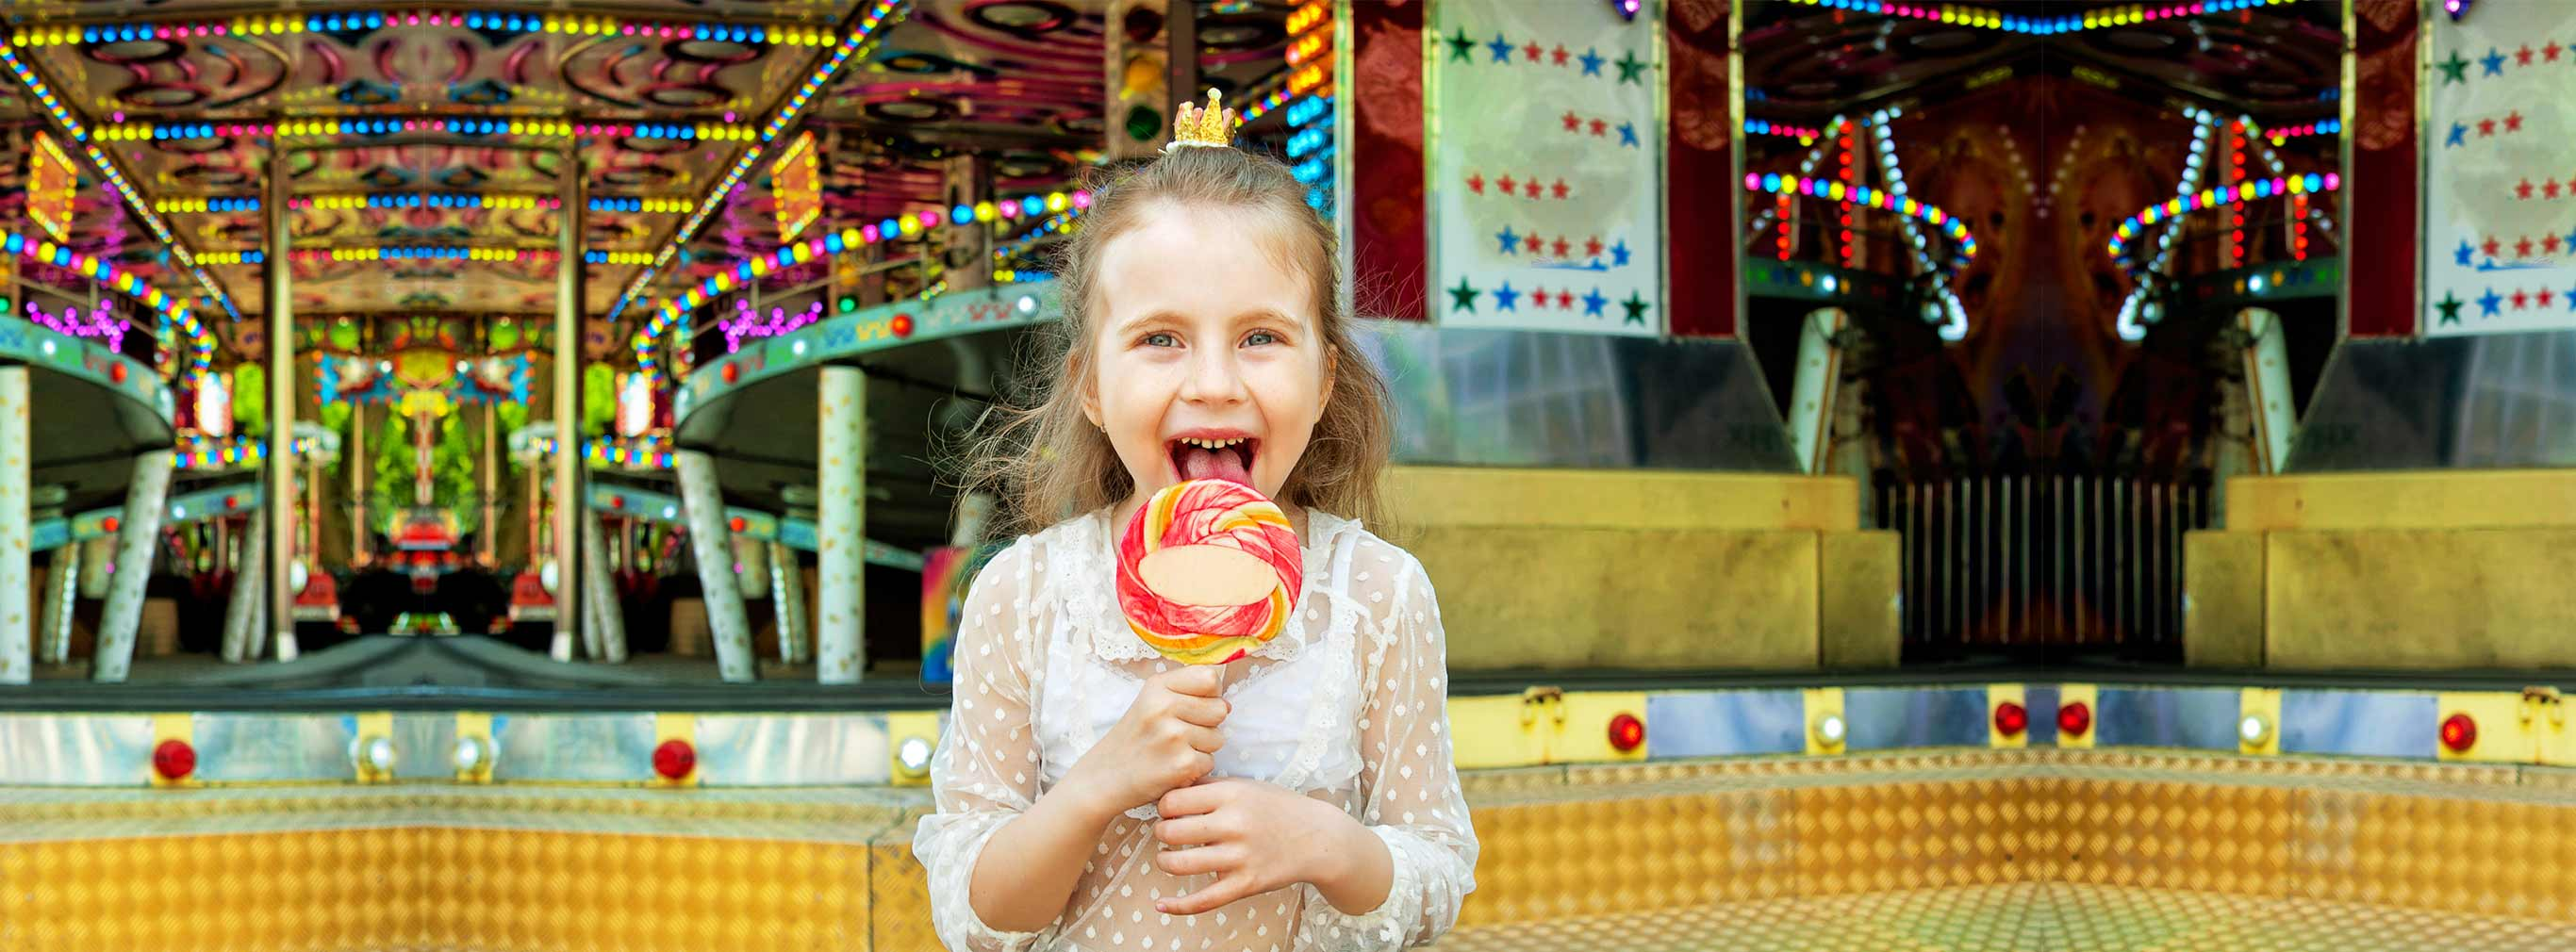 carnival amusements of s a cute little girl with lollipop at amusement park